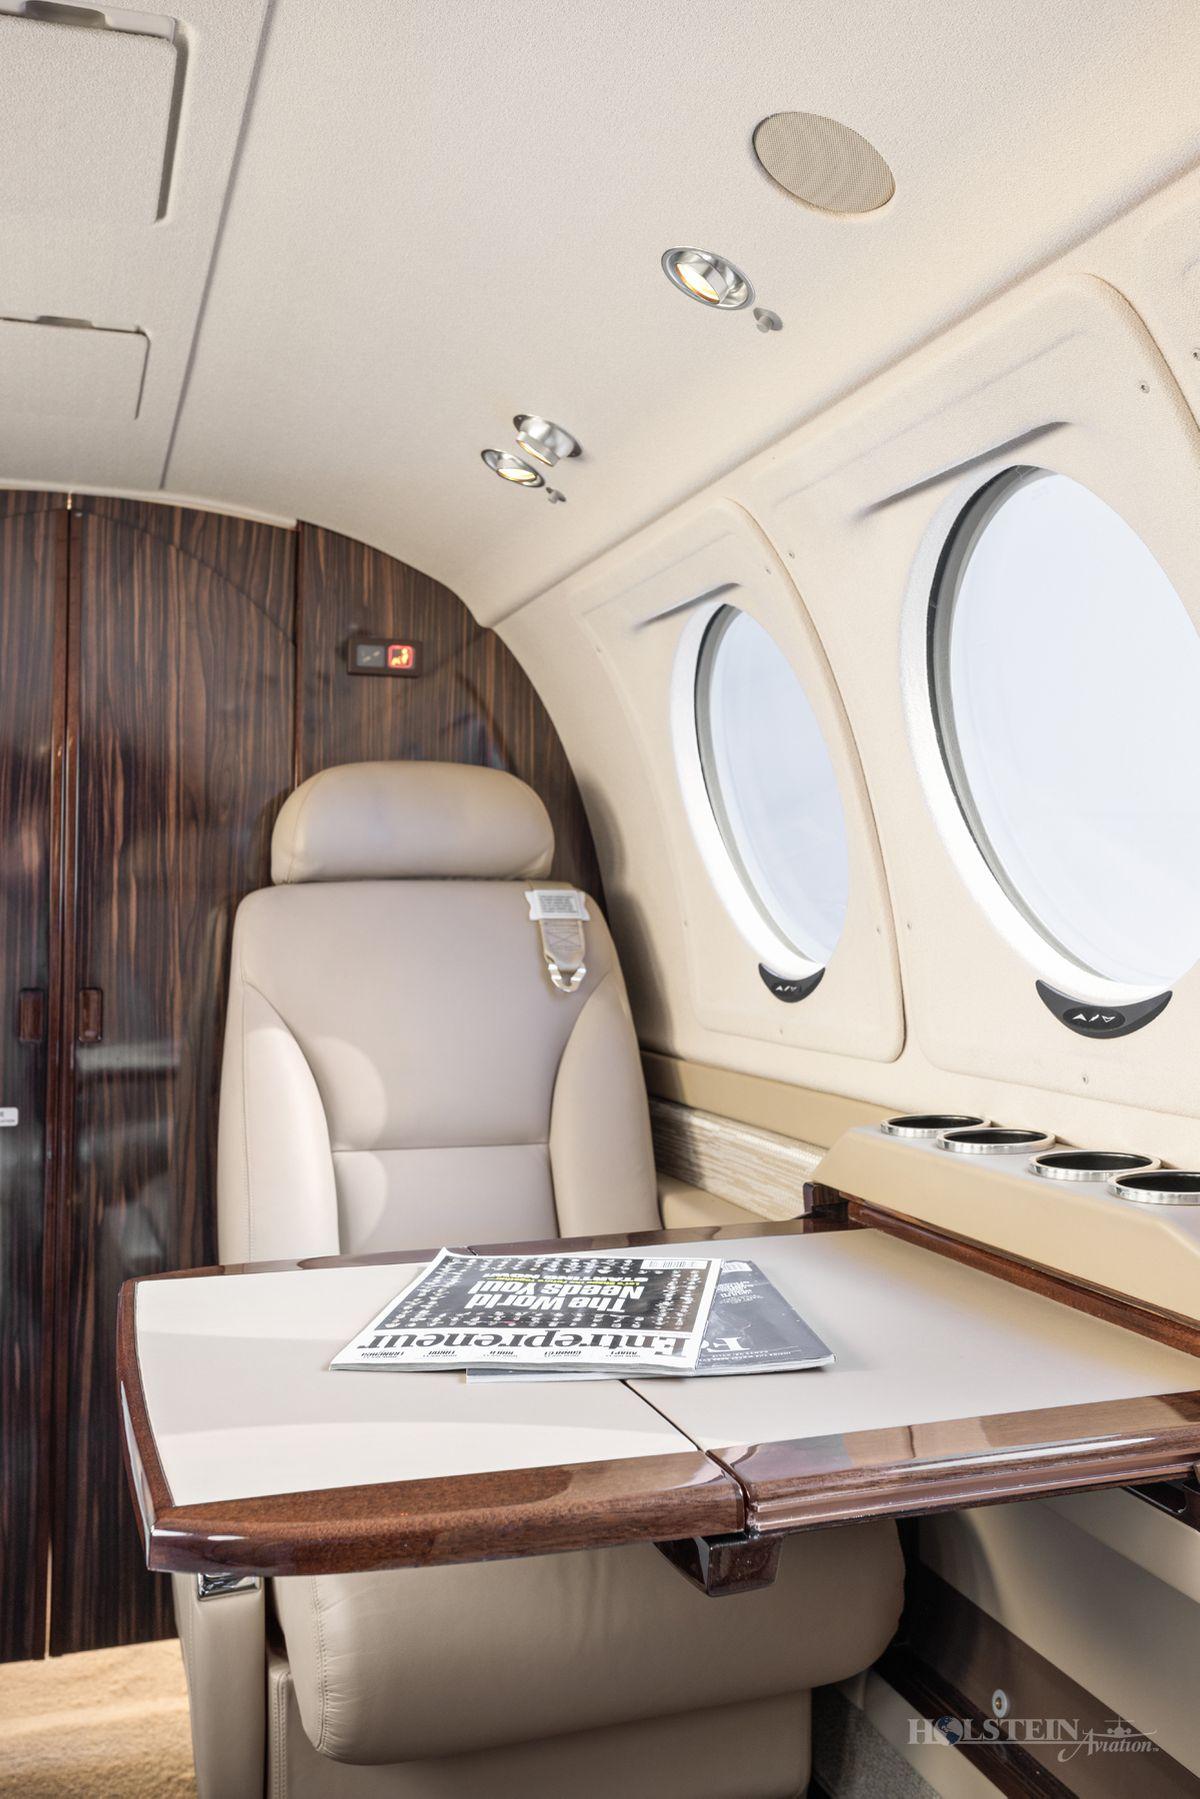 2018 King Air 250 - BY-342 - N94MJ - Int - Seat w-tbl ext RGB.jpg